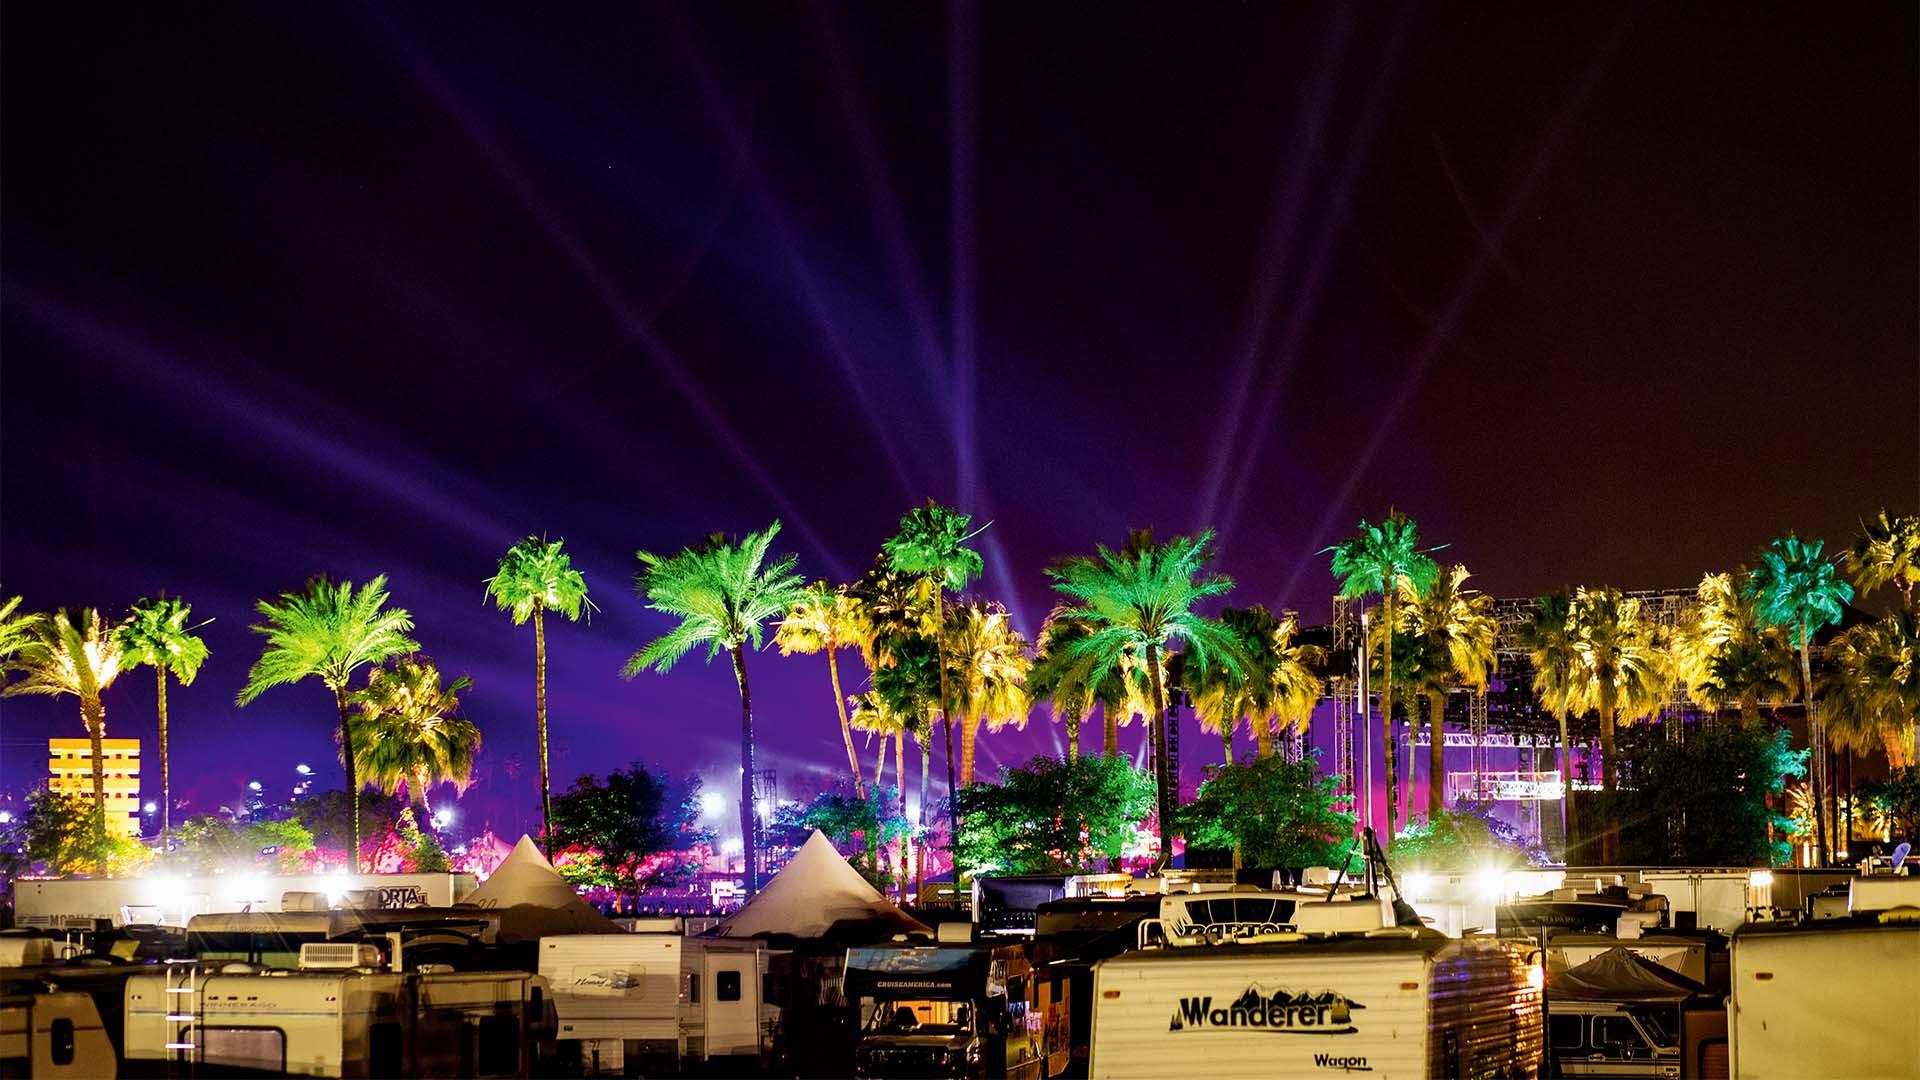 Palms at night, Coachella Festival 2016